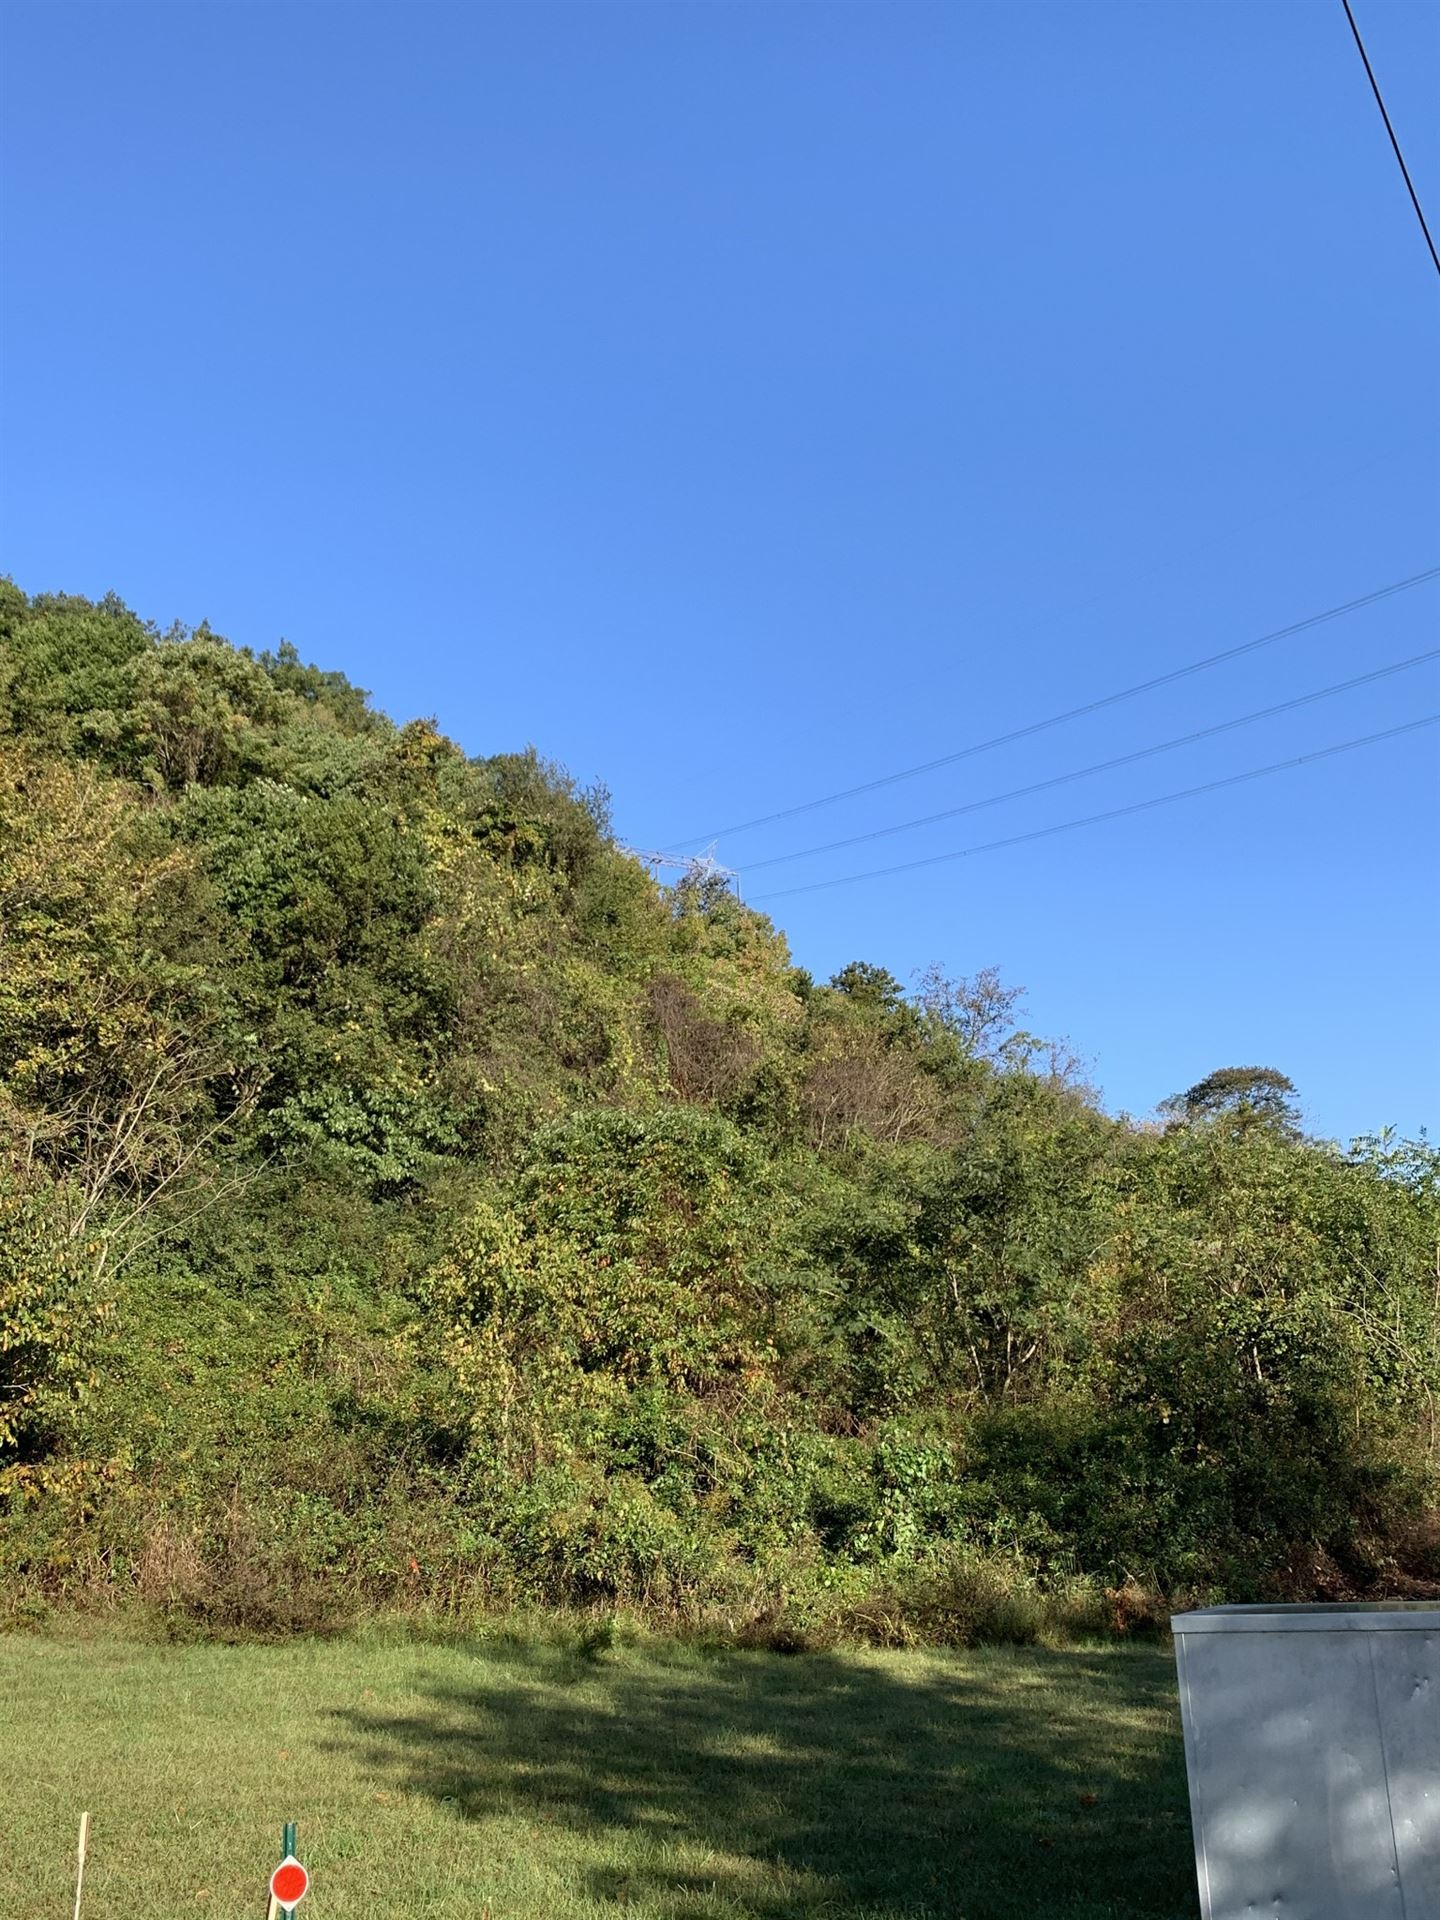 Photo of 1357 Holly Tree Gap Rd N, Brentwood, TN 37027 (MLS # 2222423)